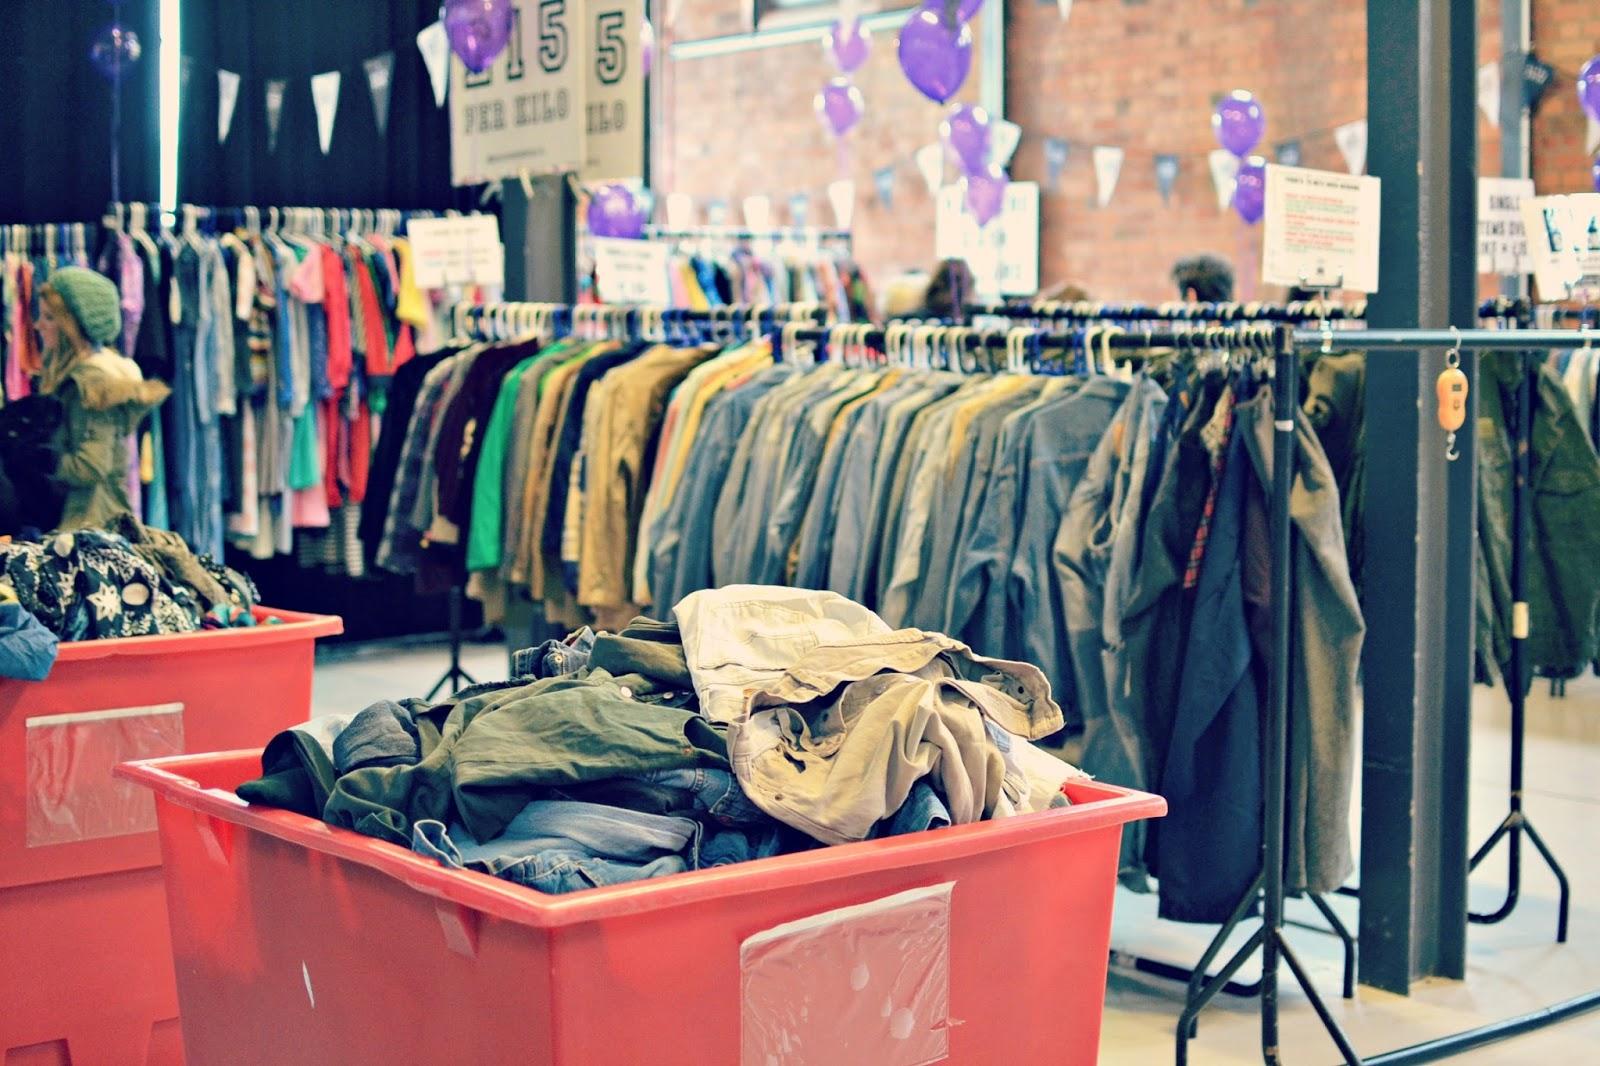 vintage kilo sale, jeans, jackets